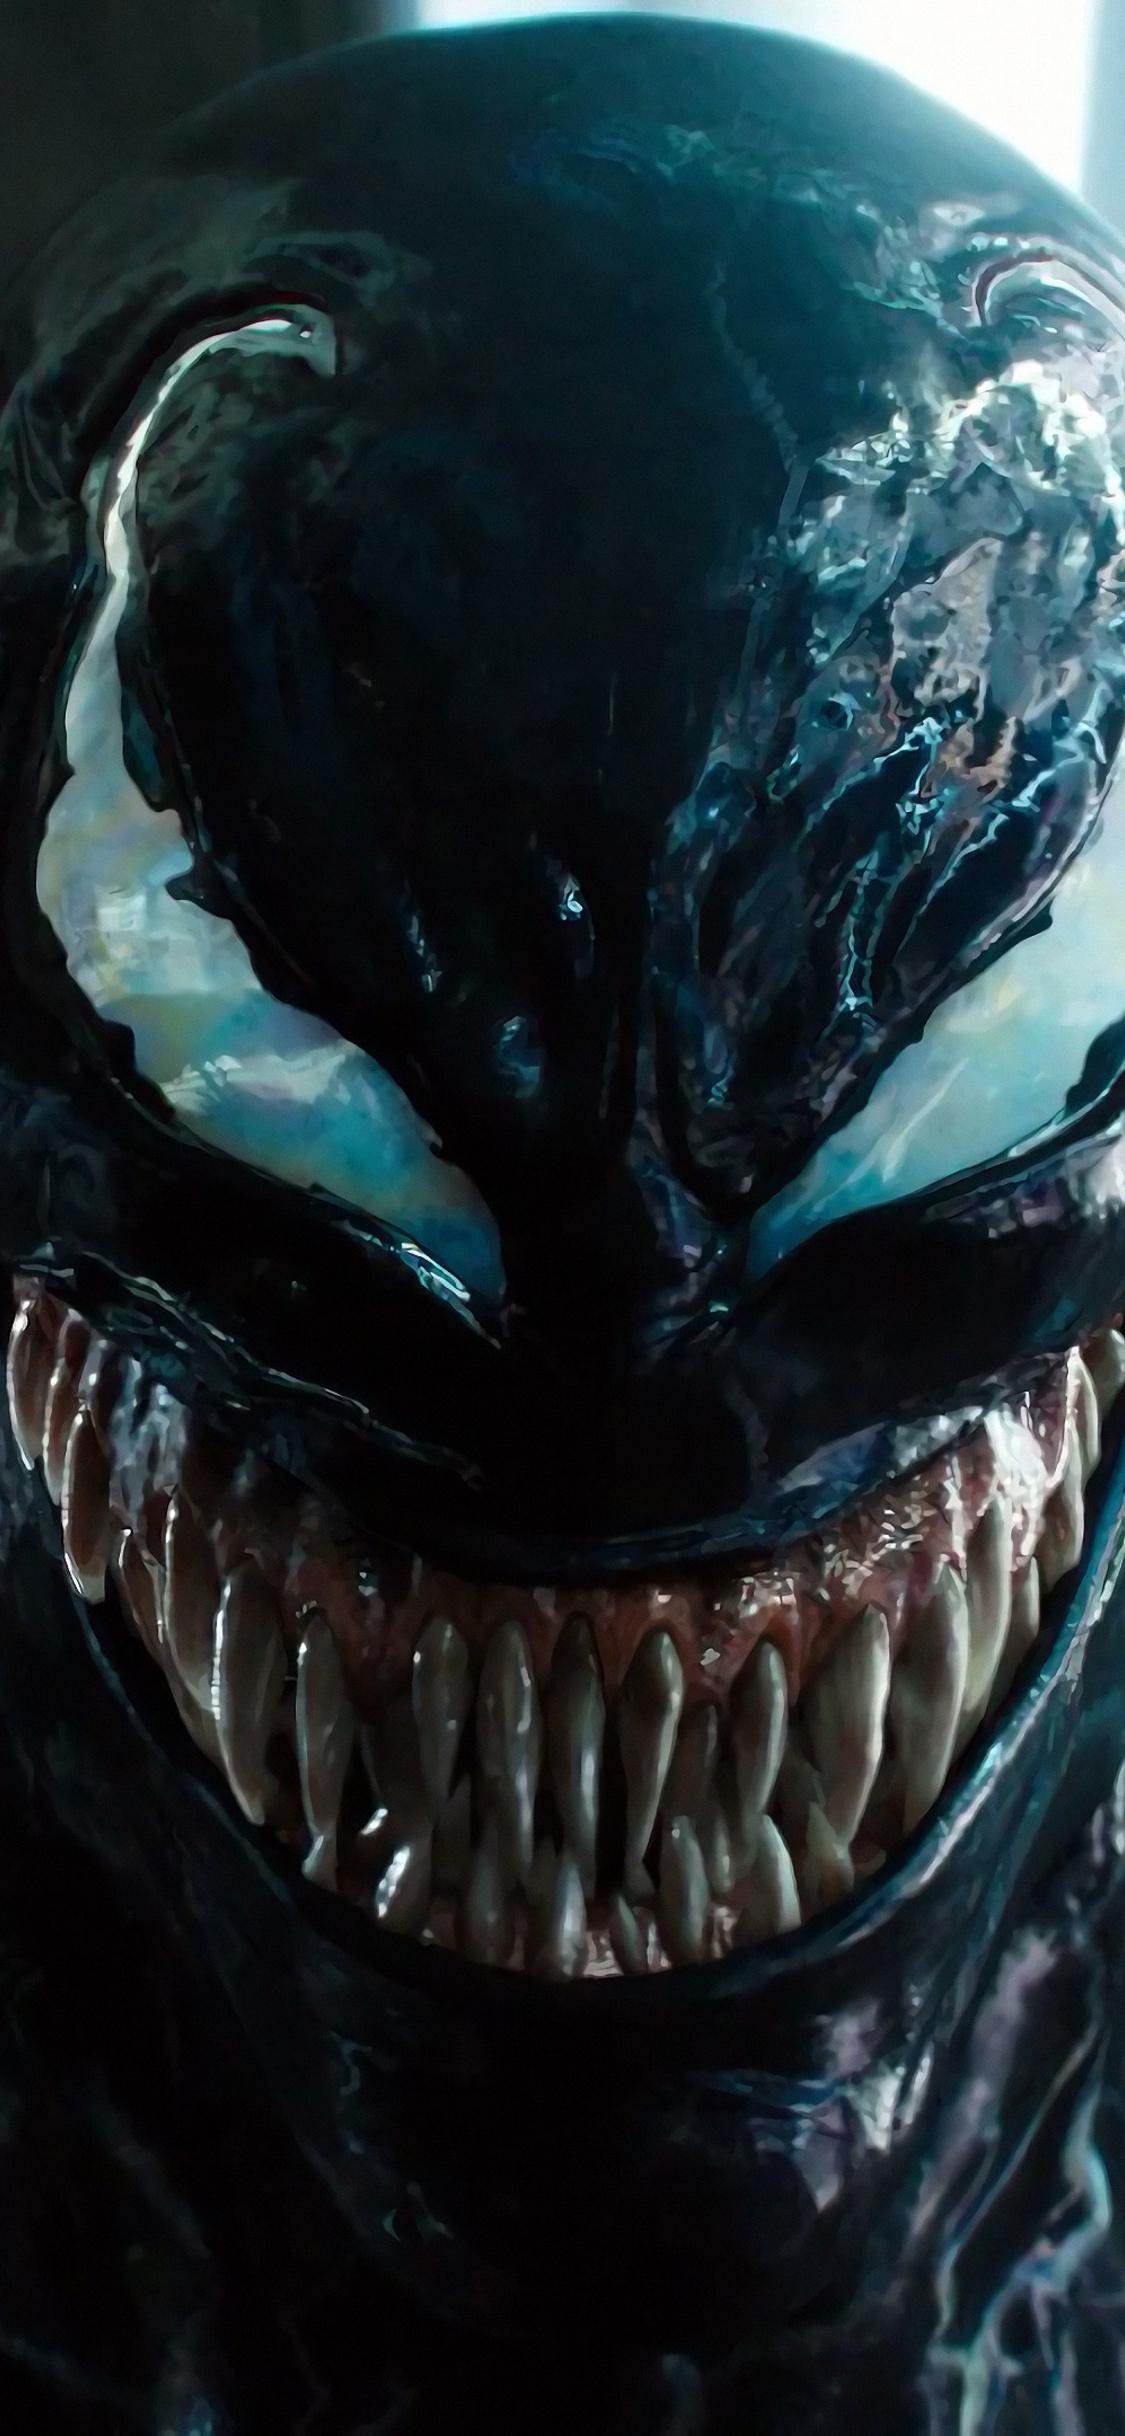 1125x2436 Venom 2018 Movie 4k Iphone Xs Iphone 10 Iphone X Hd 4k